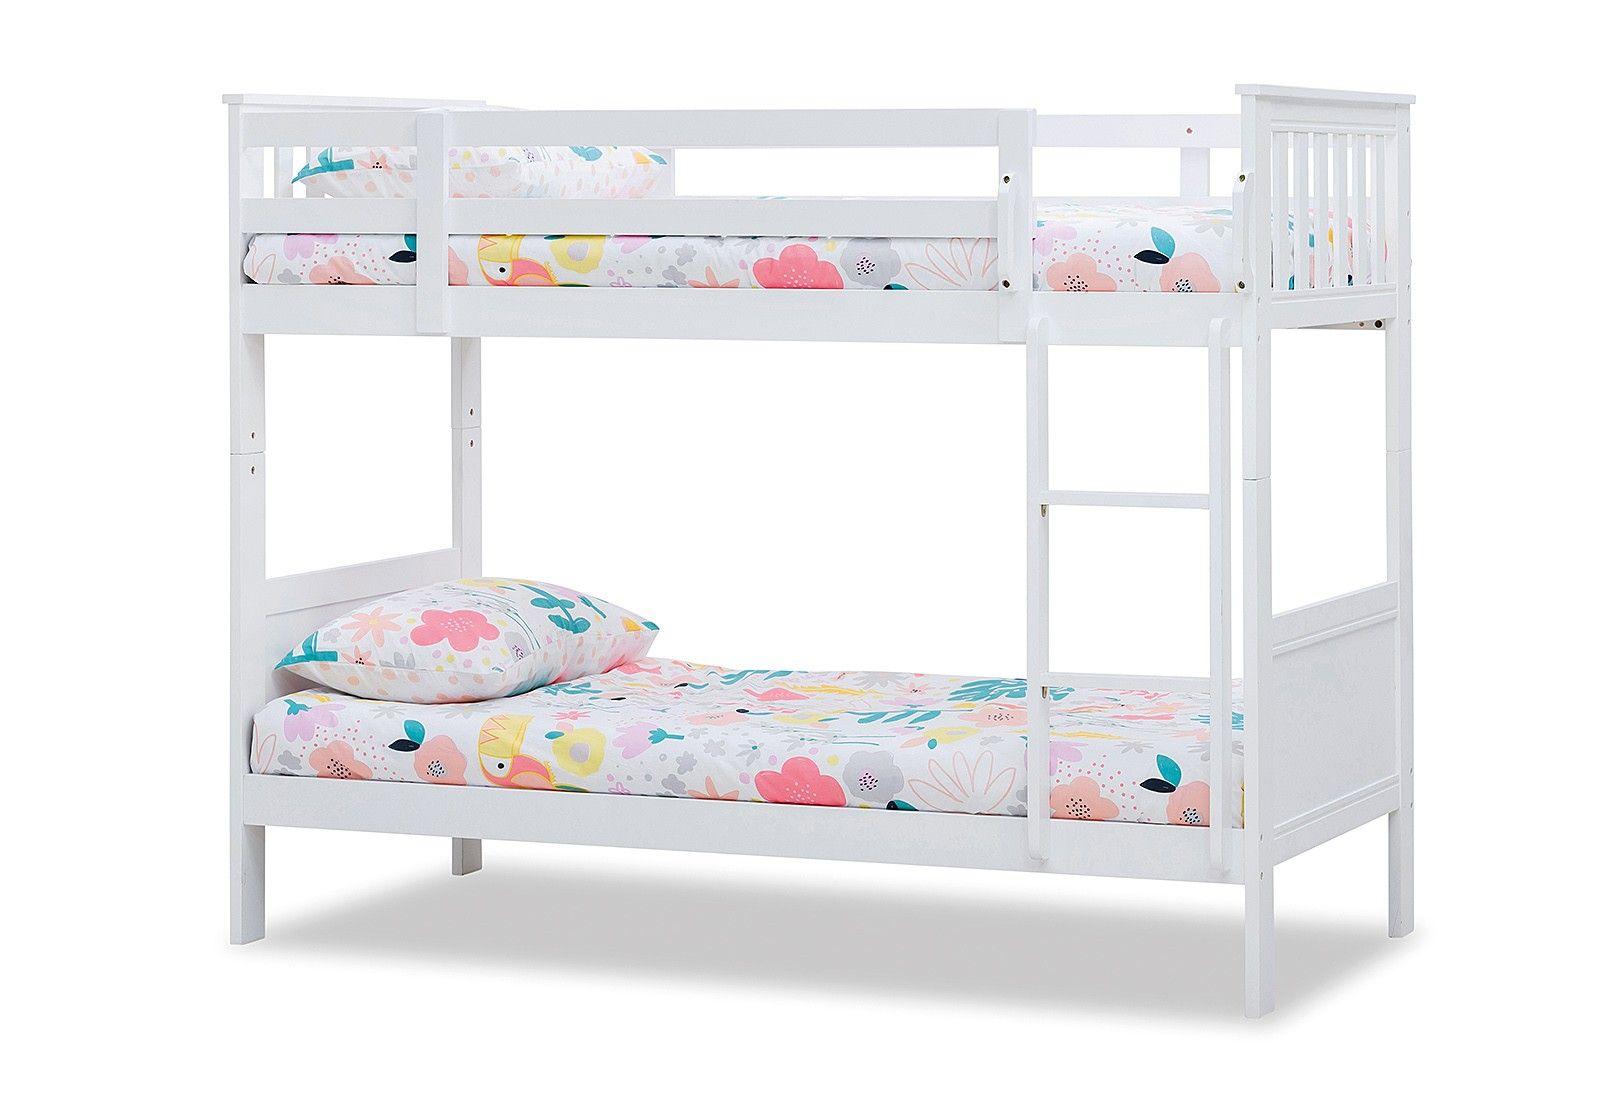 Captain Jack Double Bunk Bed Amart Furniture Bunk Bed Designs